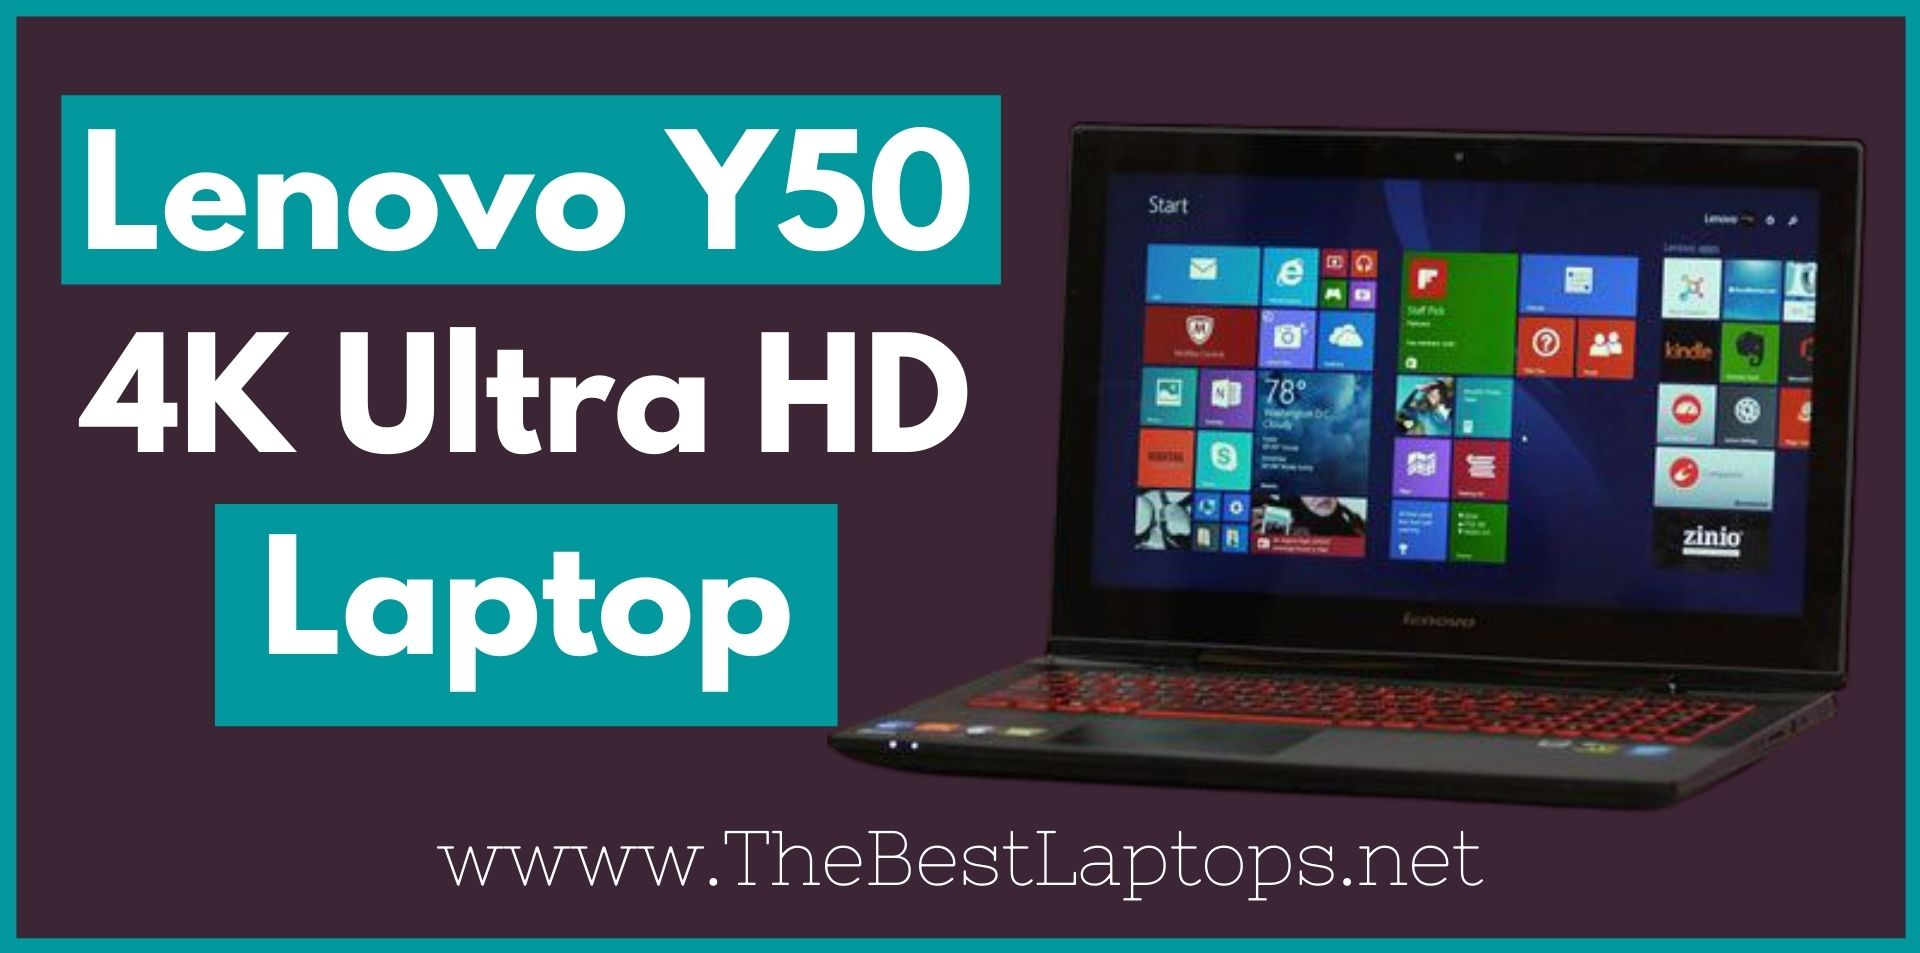 Lenovo Y50 4K Ultra HD Laptop